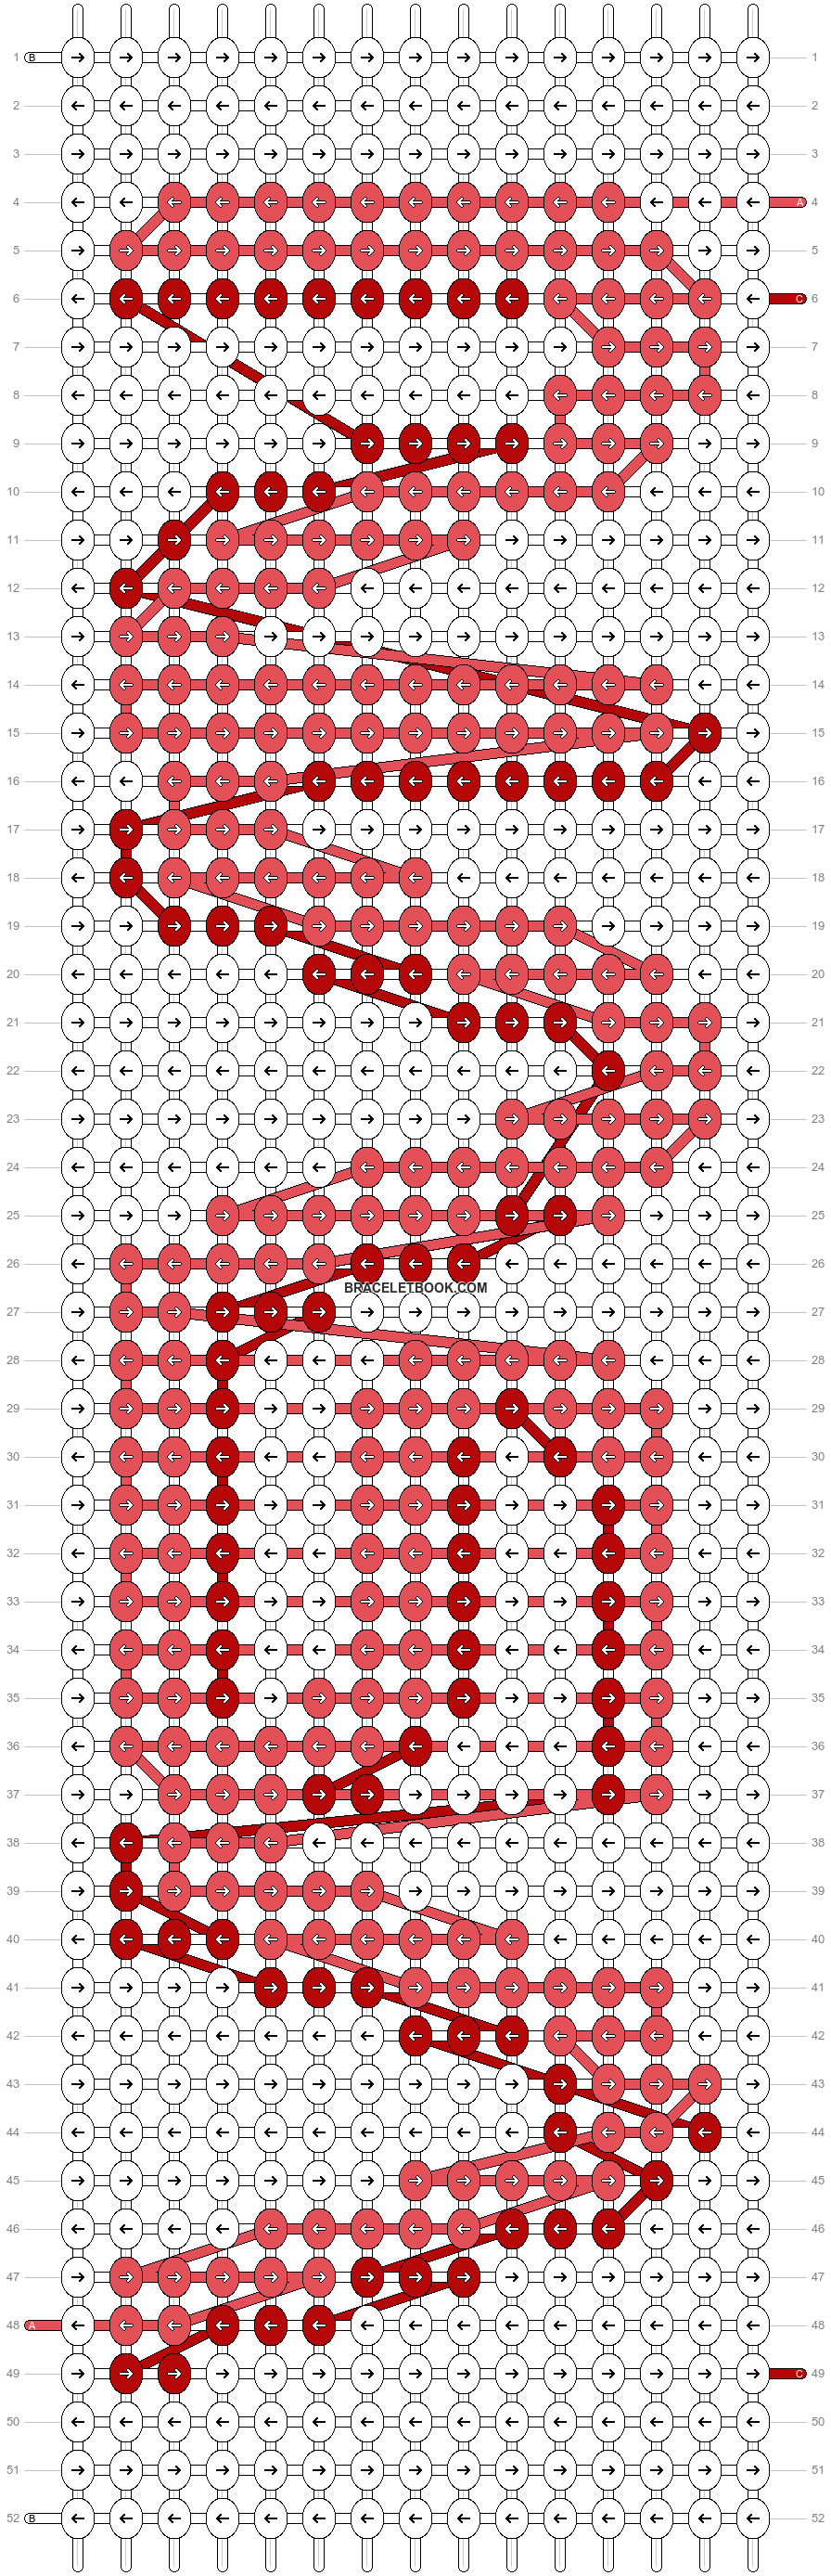 Alpha pattern #57624 pattern